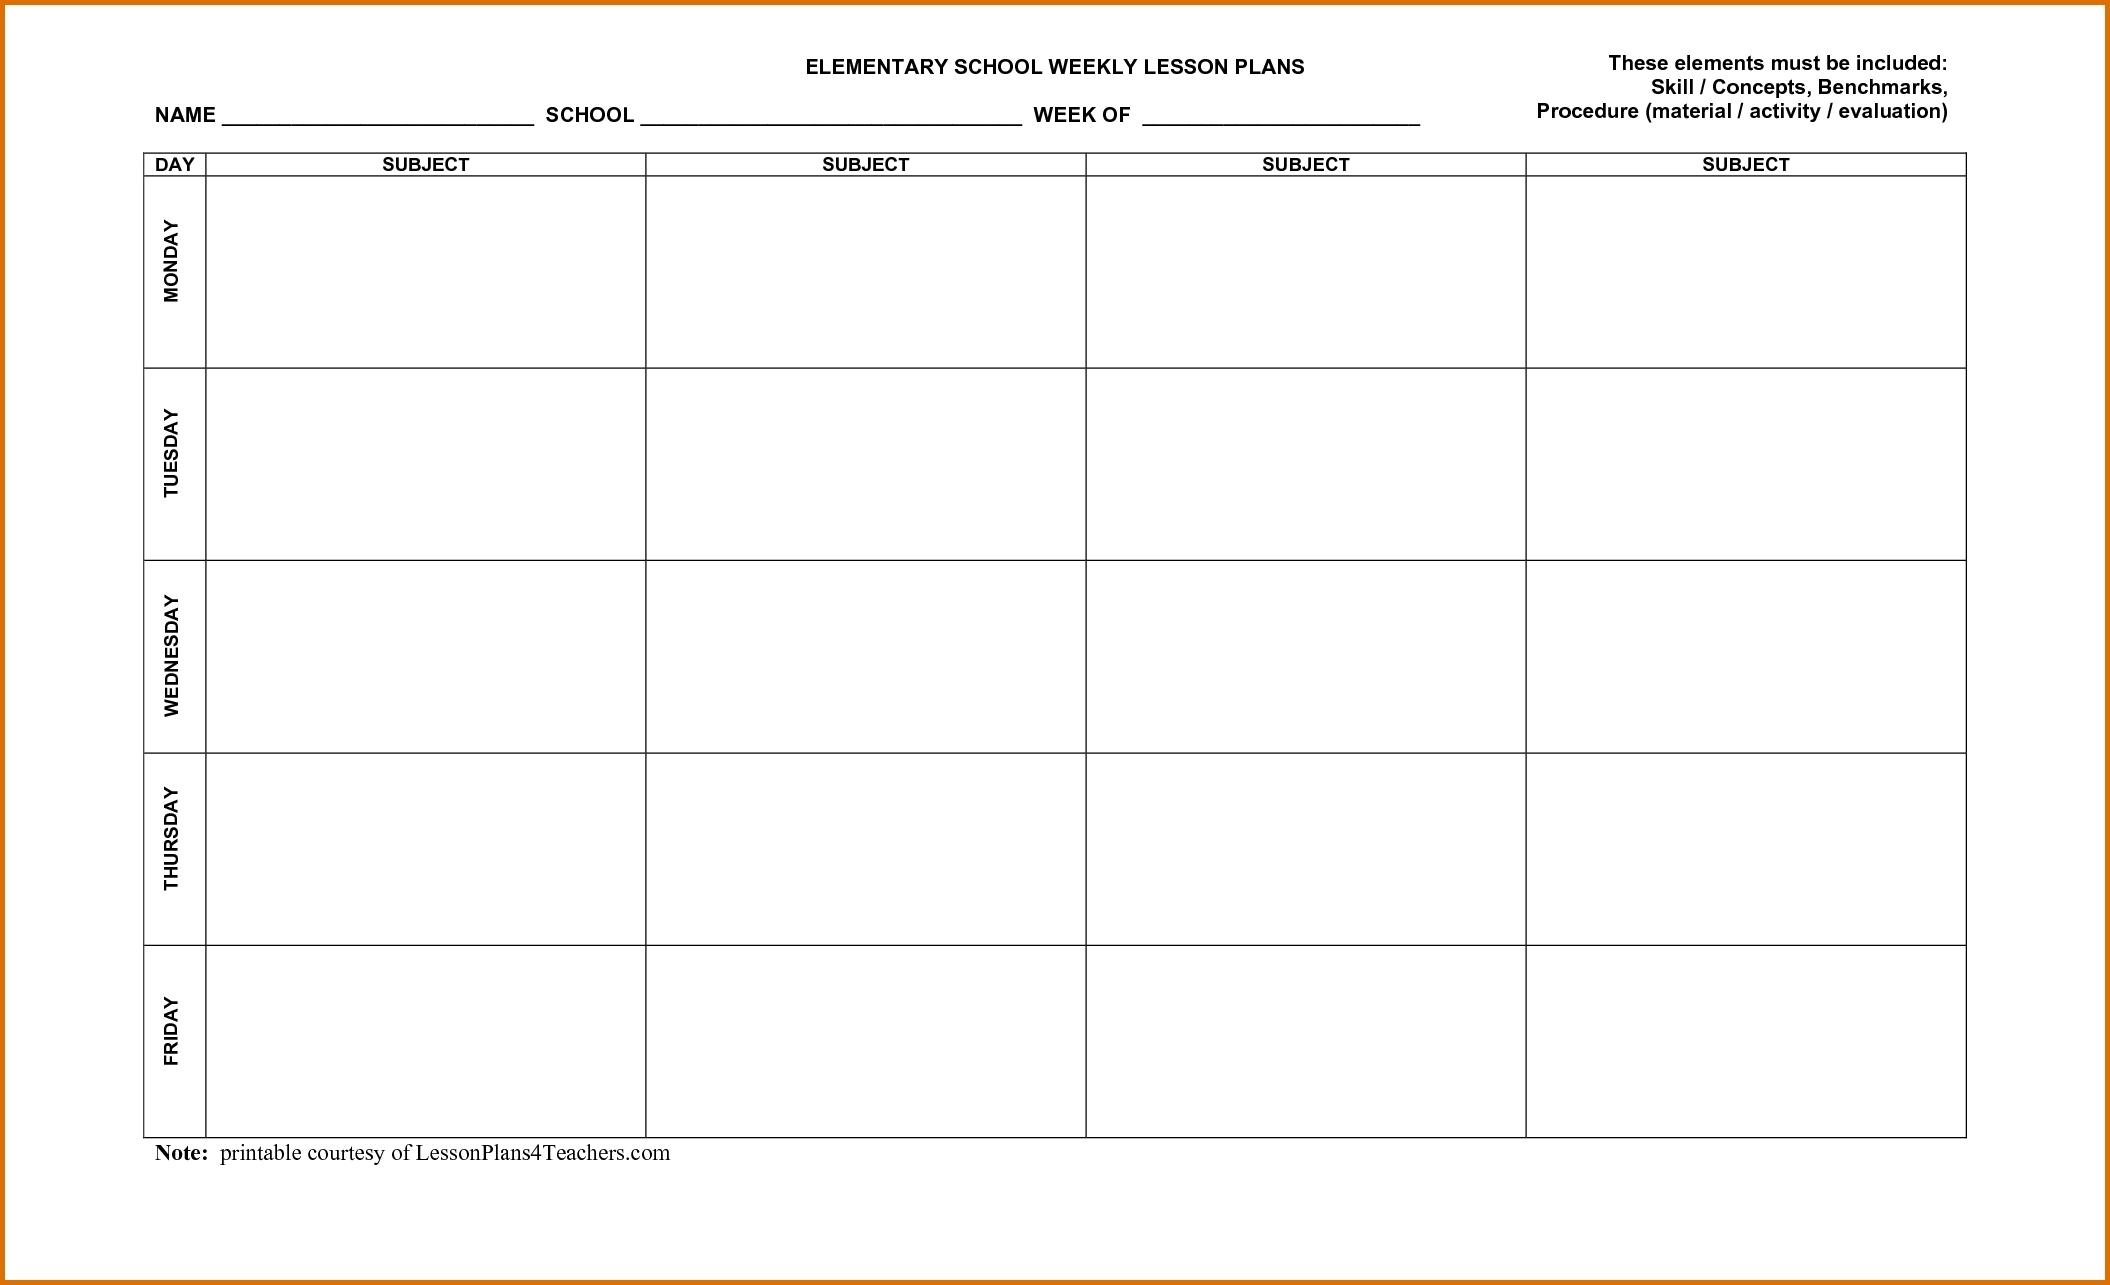 Weekly Calendar Lesson Plan Template | Jazz Gear with Weekly Calander Lesson Plan Template